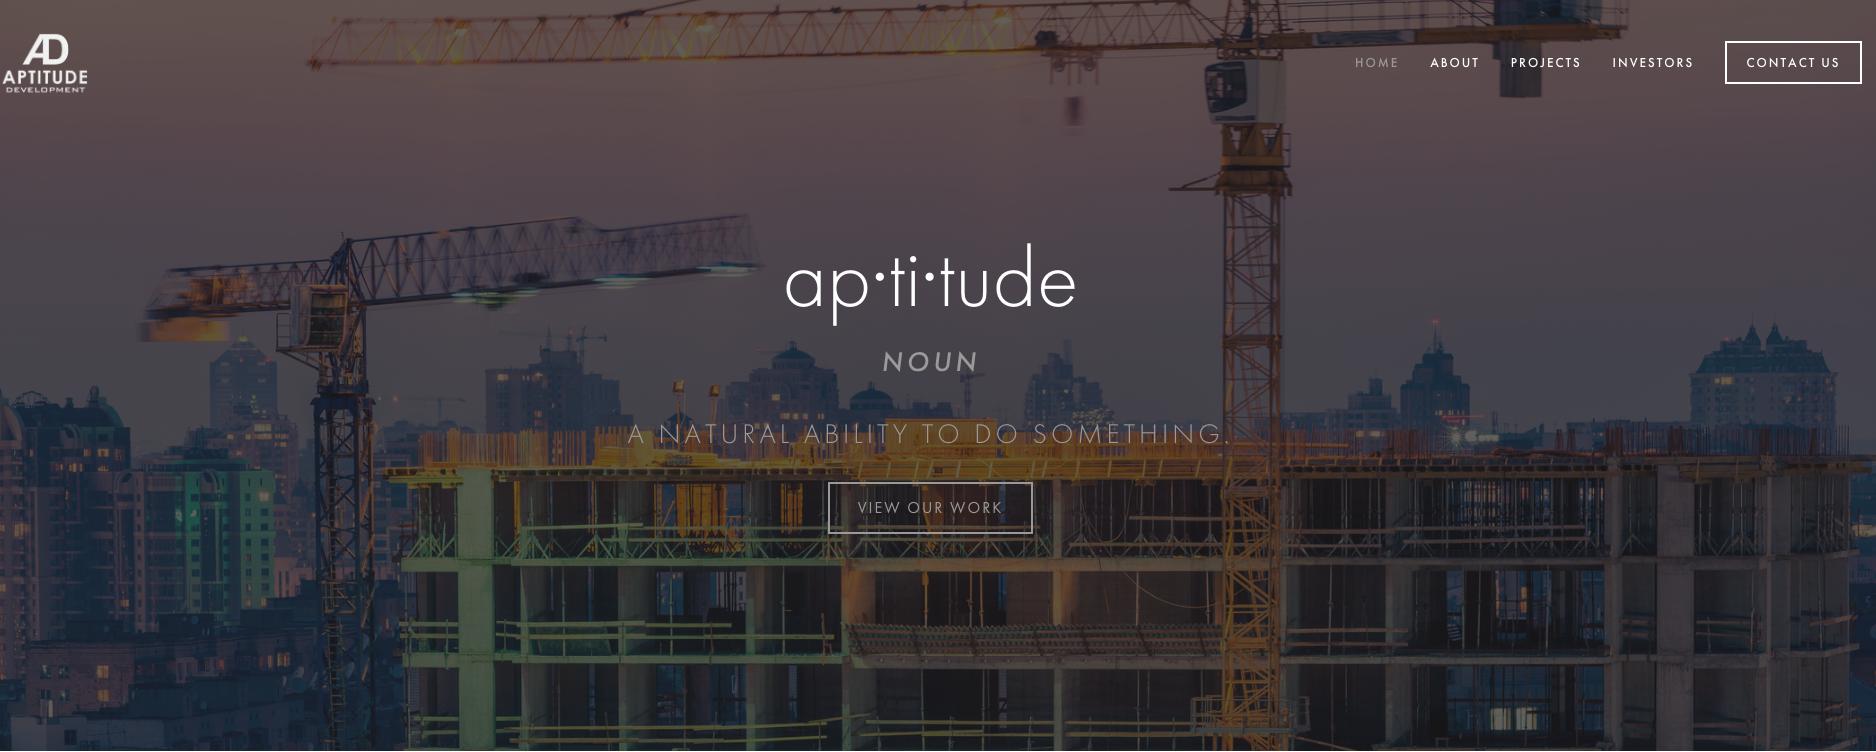 Aptitude Real Estate Development Website